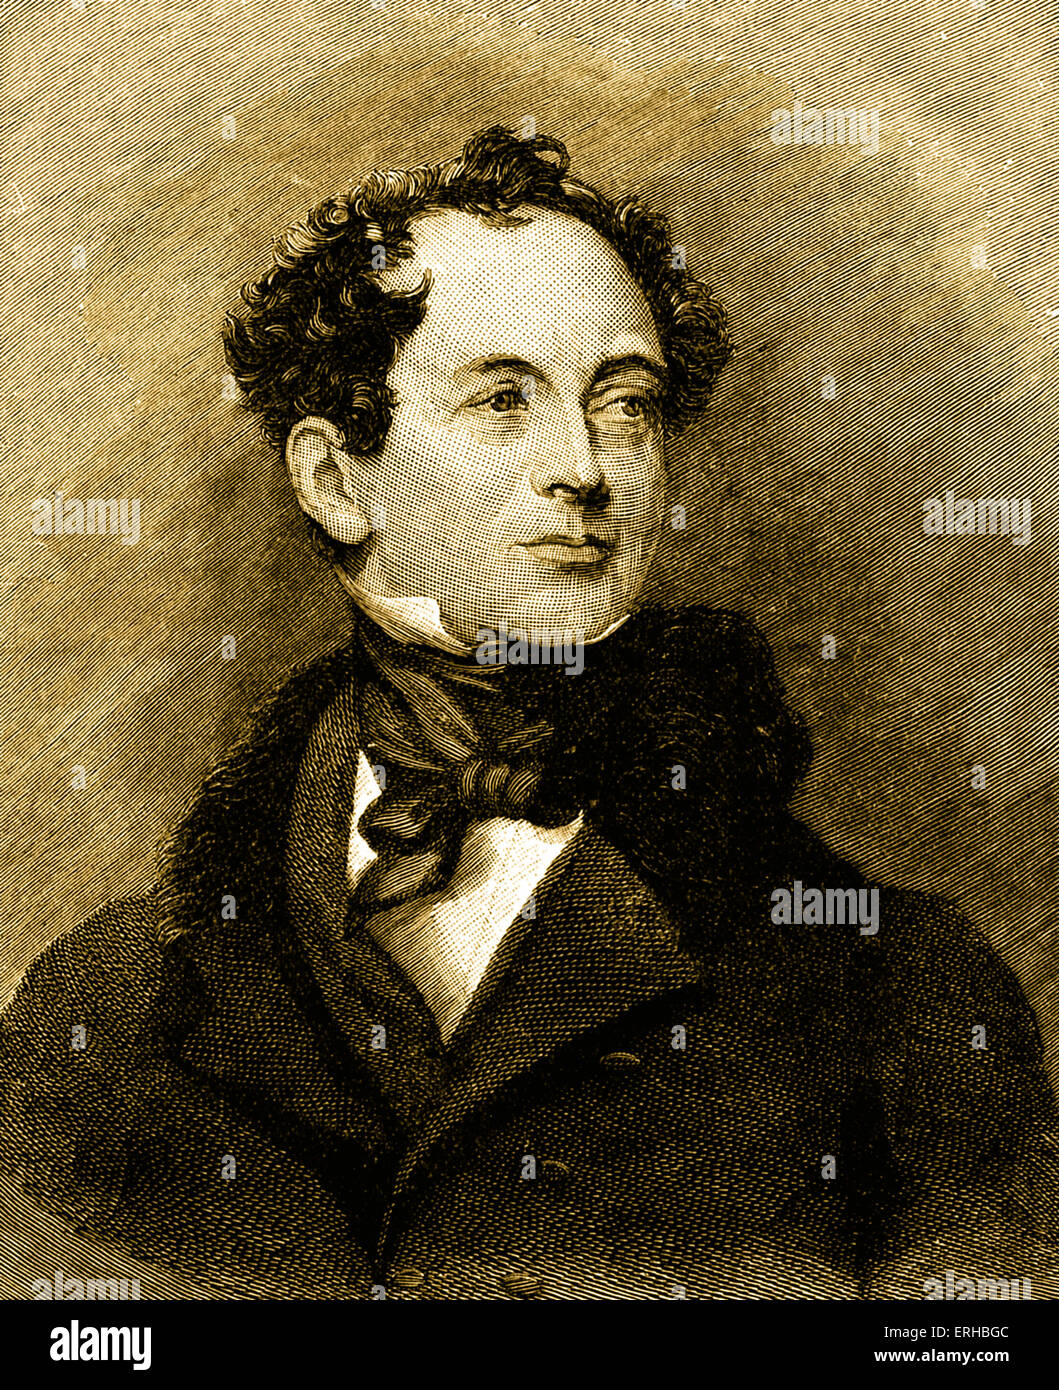 Thomas Moore - portrait of  Irish writer, 1779-1852. - Stock Image